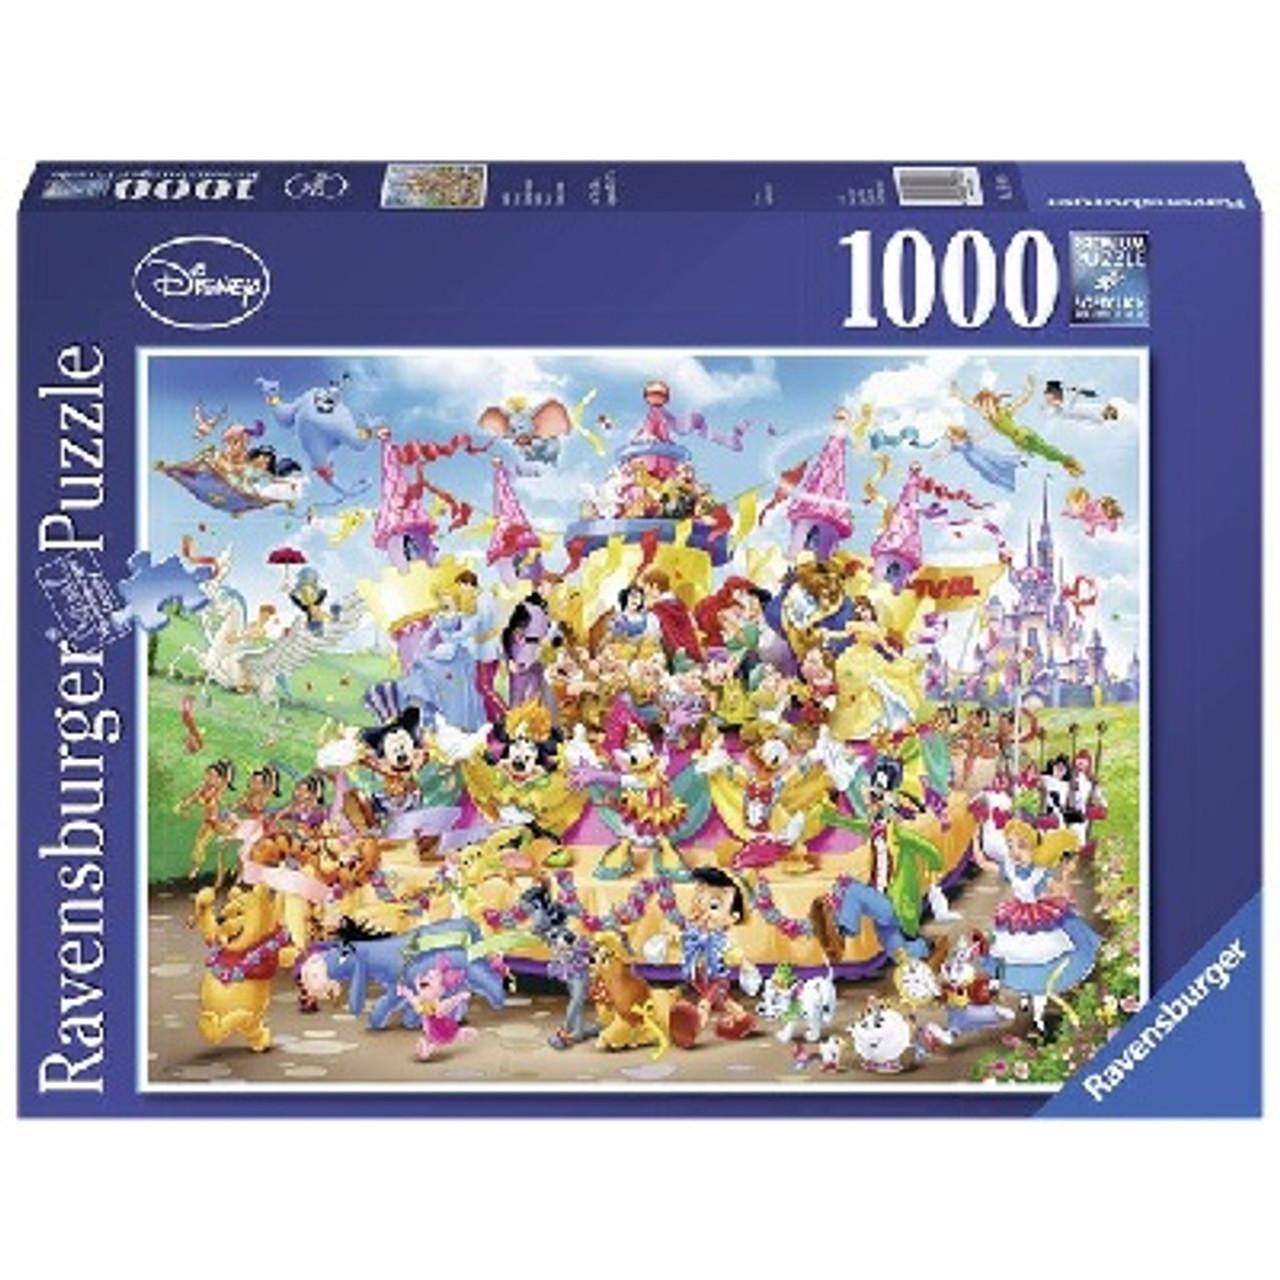 DISNEY MULTICHA PUZZLE 1000 PCS